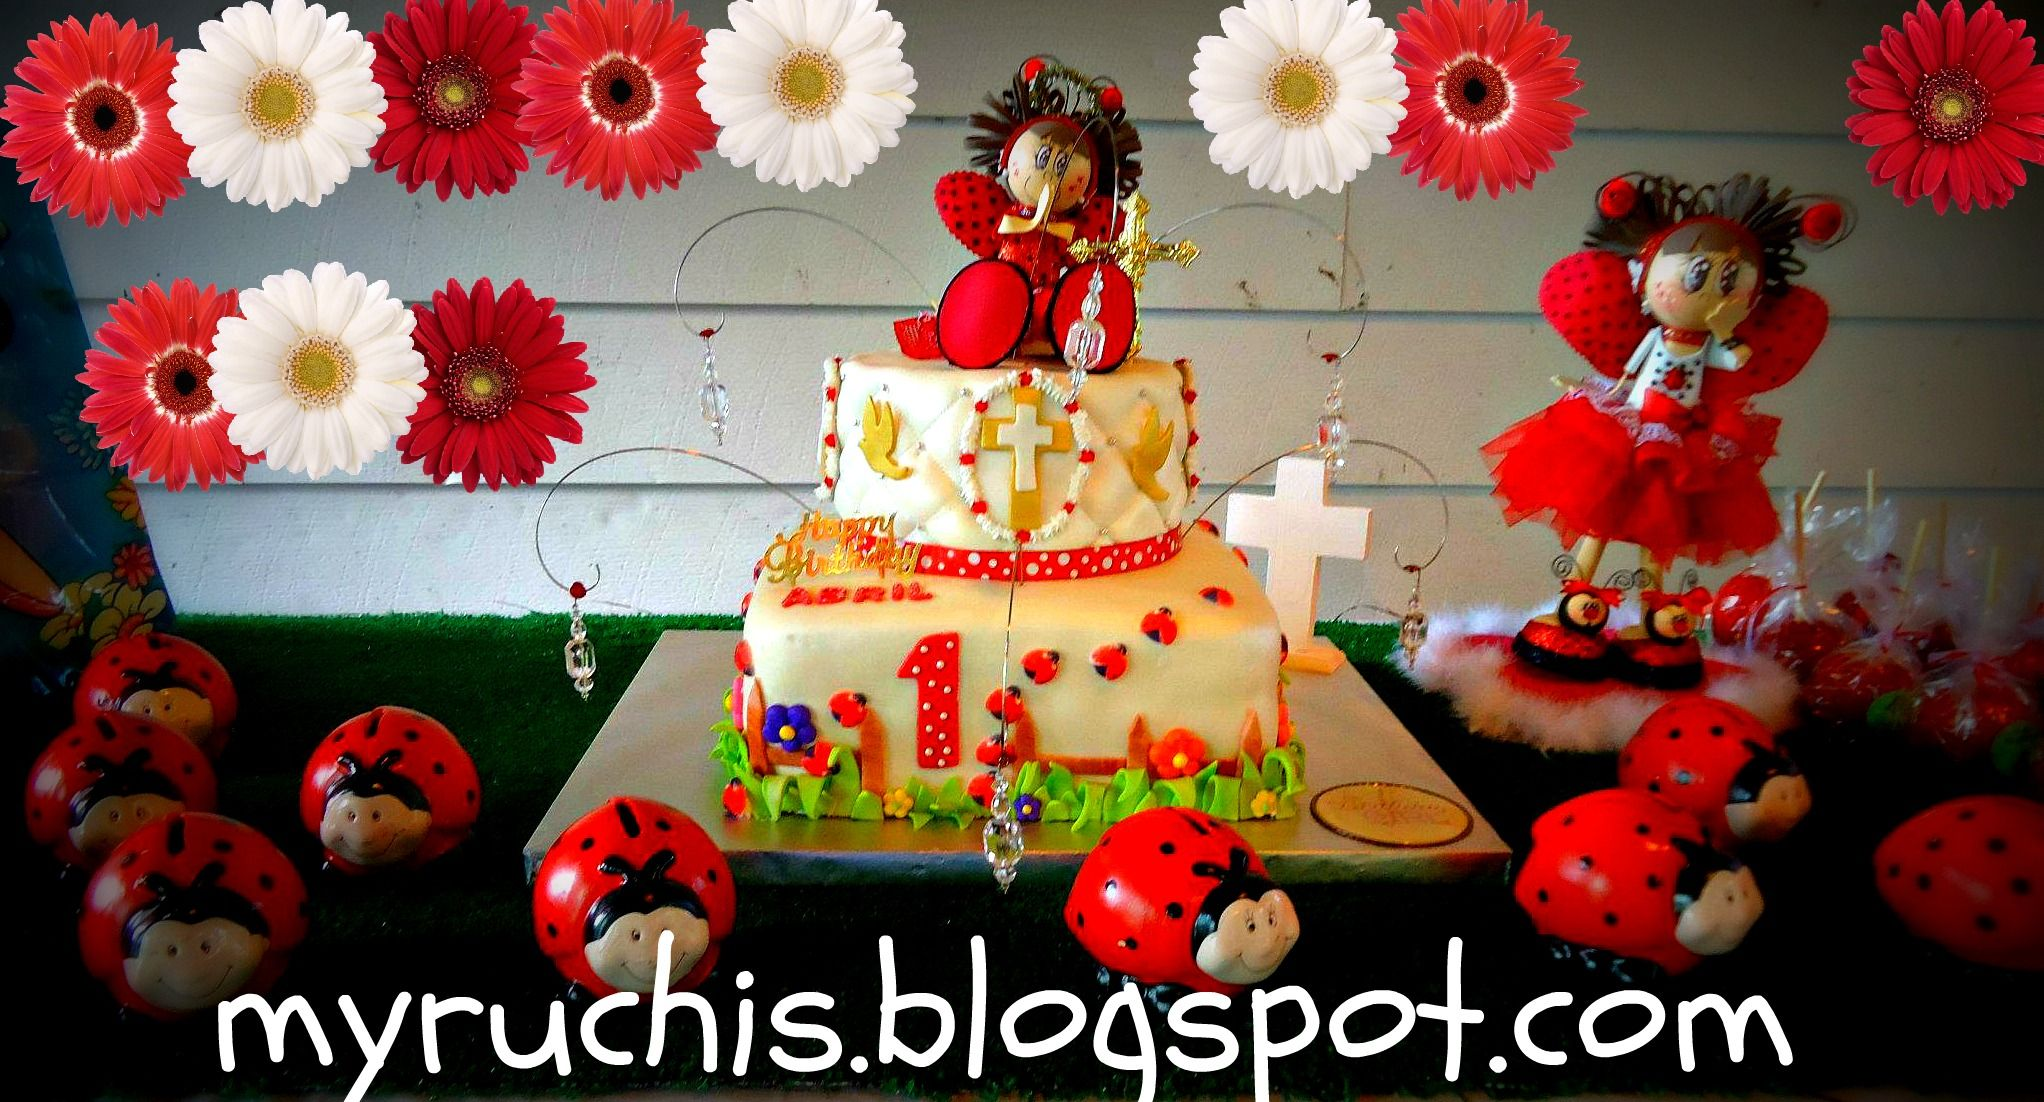 Fiesta ladybug decoraci n fiesta infantil fiesta ni a - Decoracion fiesta infantil ...